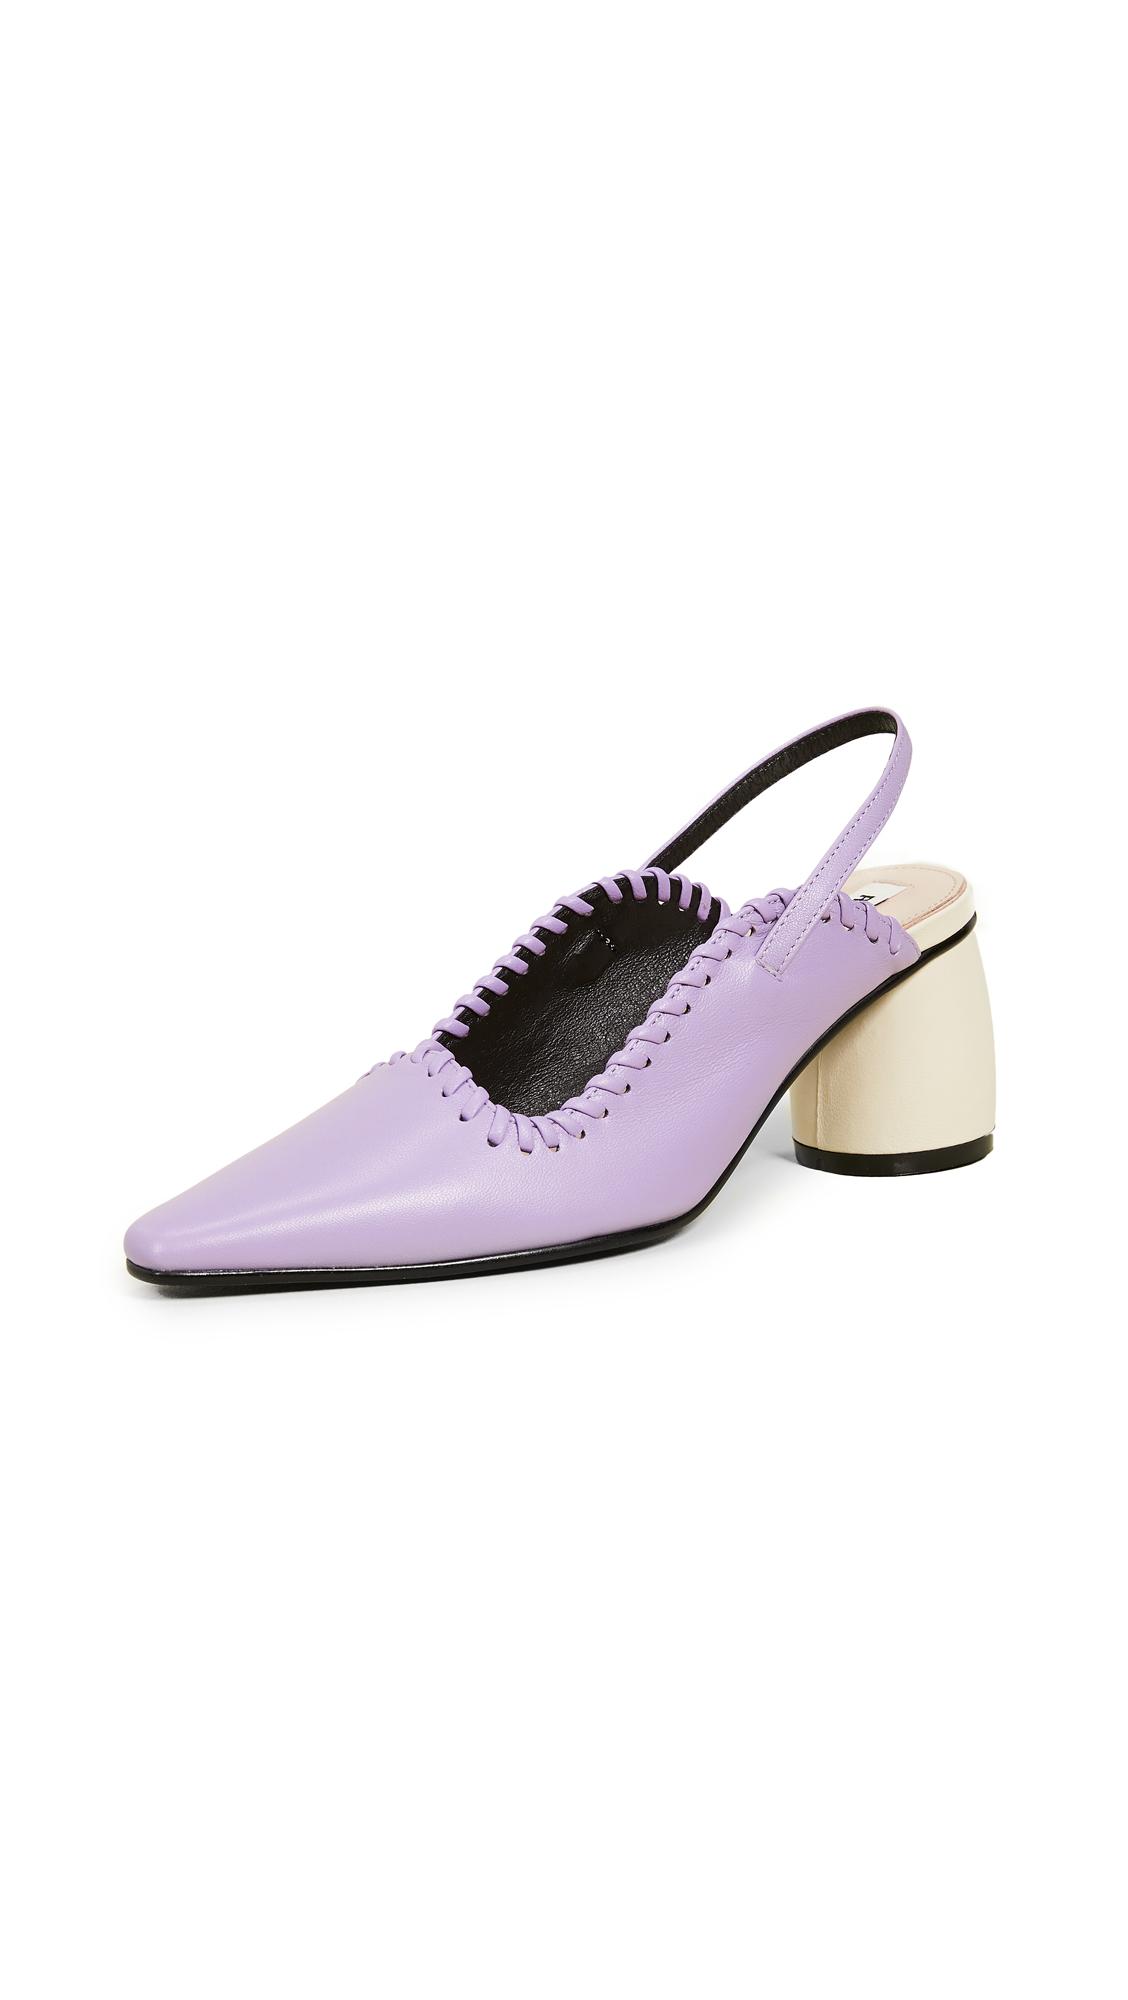 Reike Nen Curved Middle Slingback Pumps - Purple/Ivory